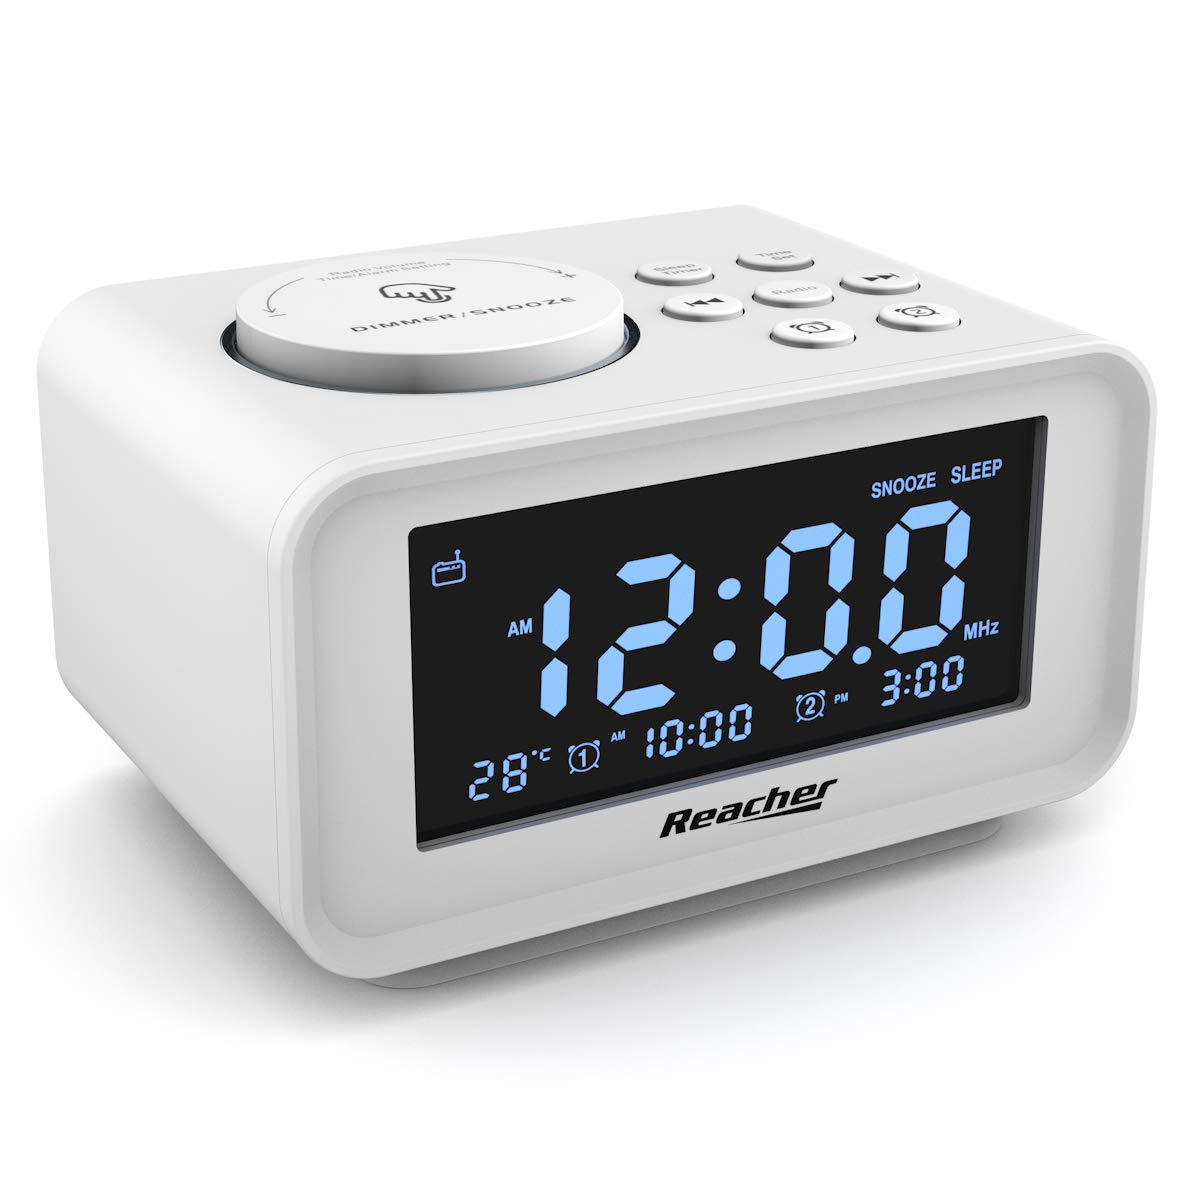 Top 9 Best Sounding Clock Radio On The Market - Buyer's Guide 36